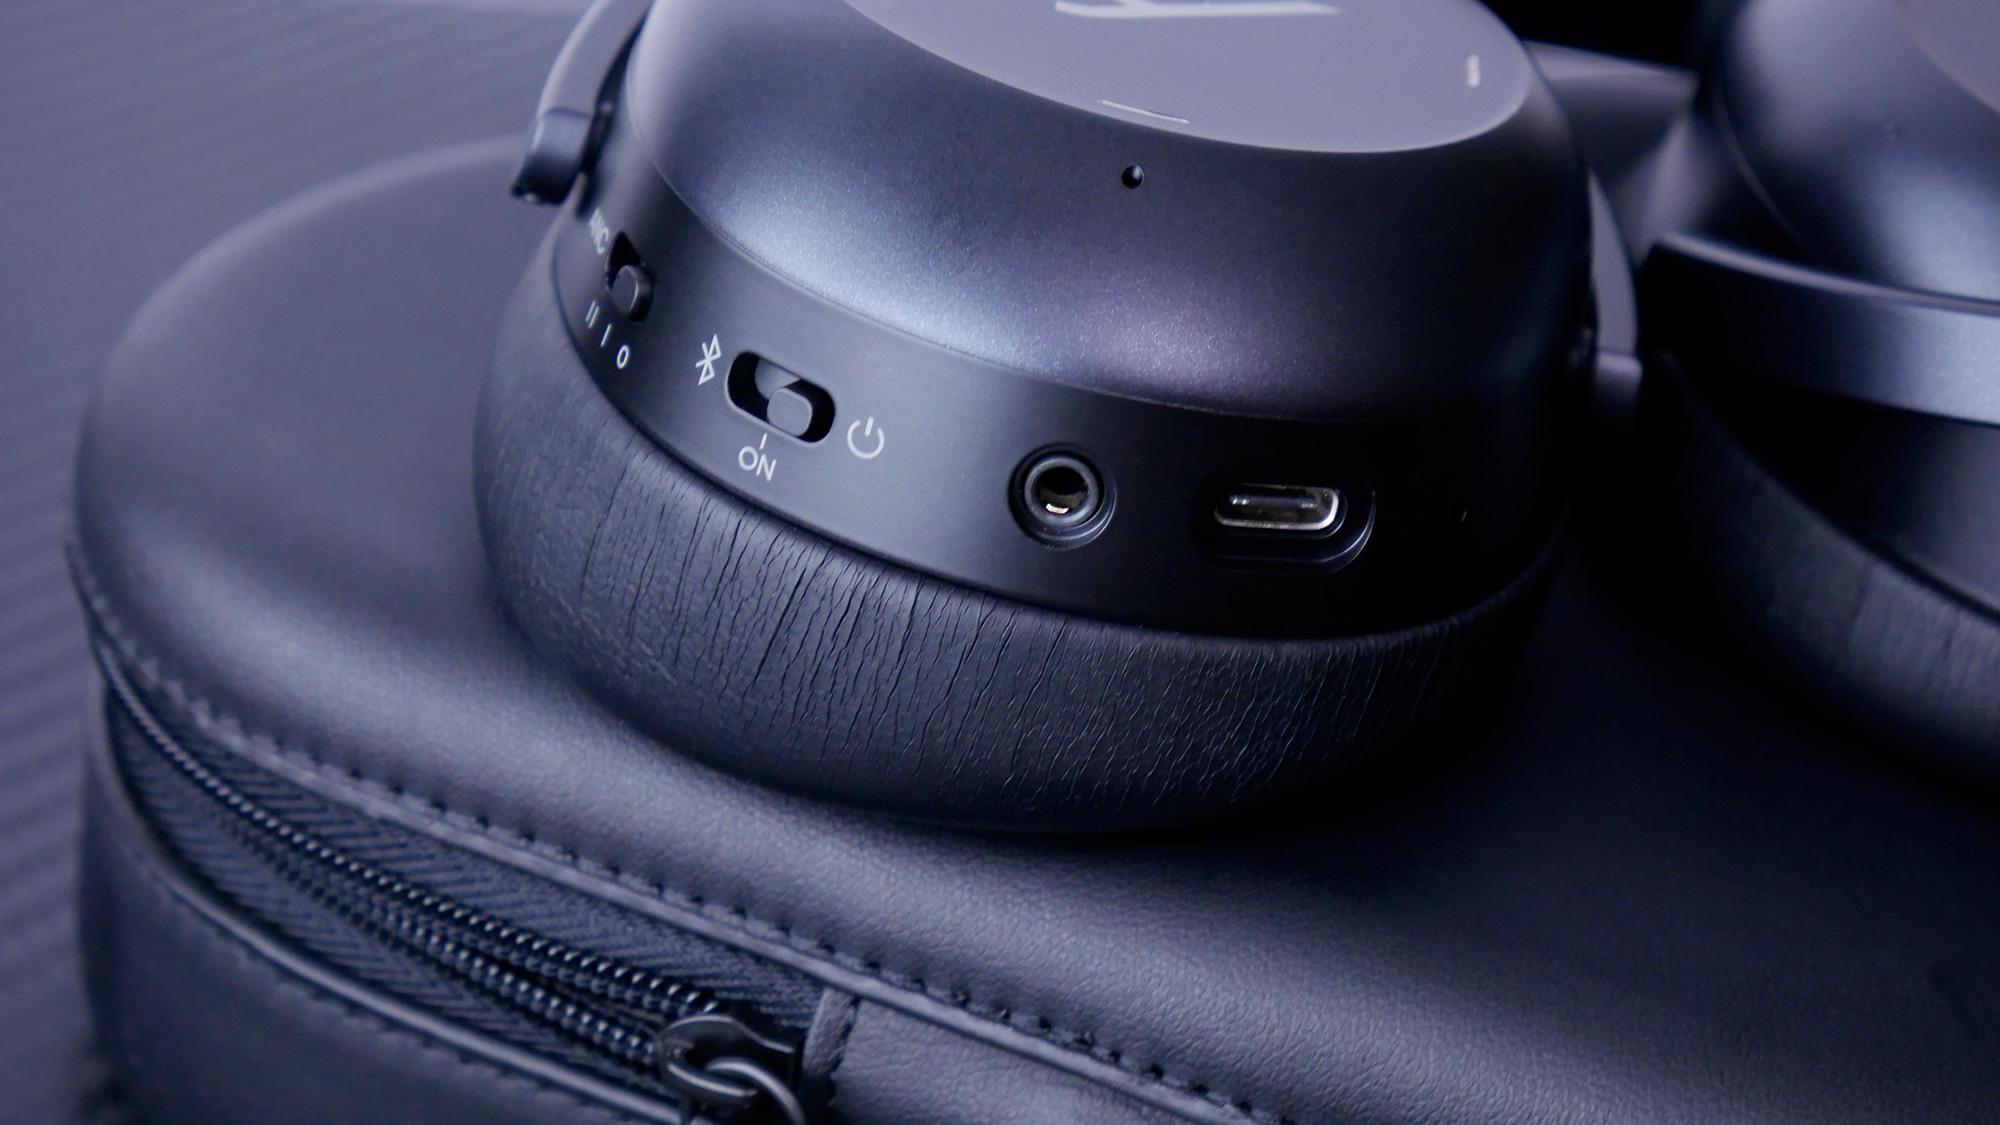 Most Useful Gadgets -